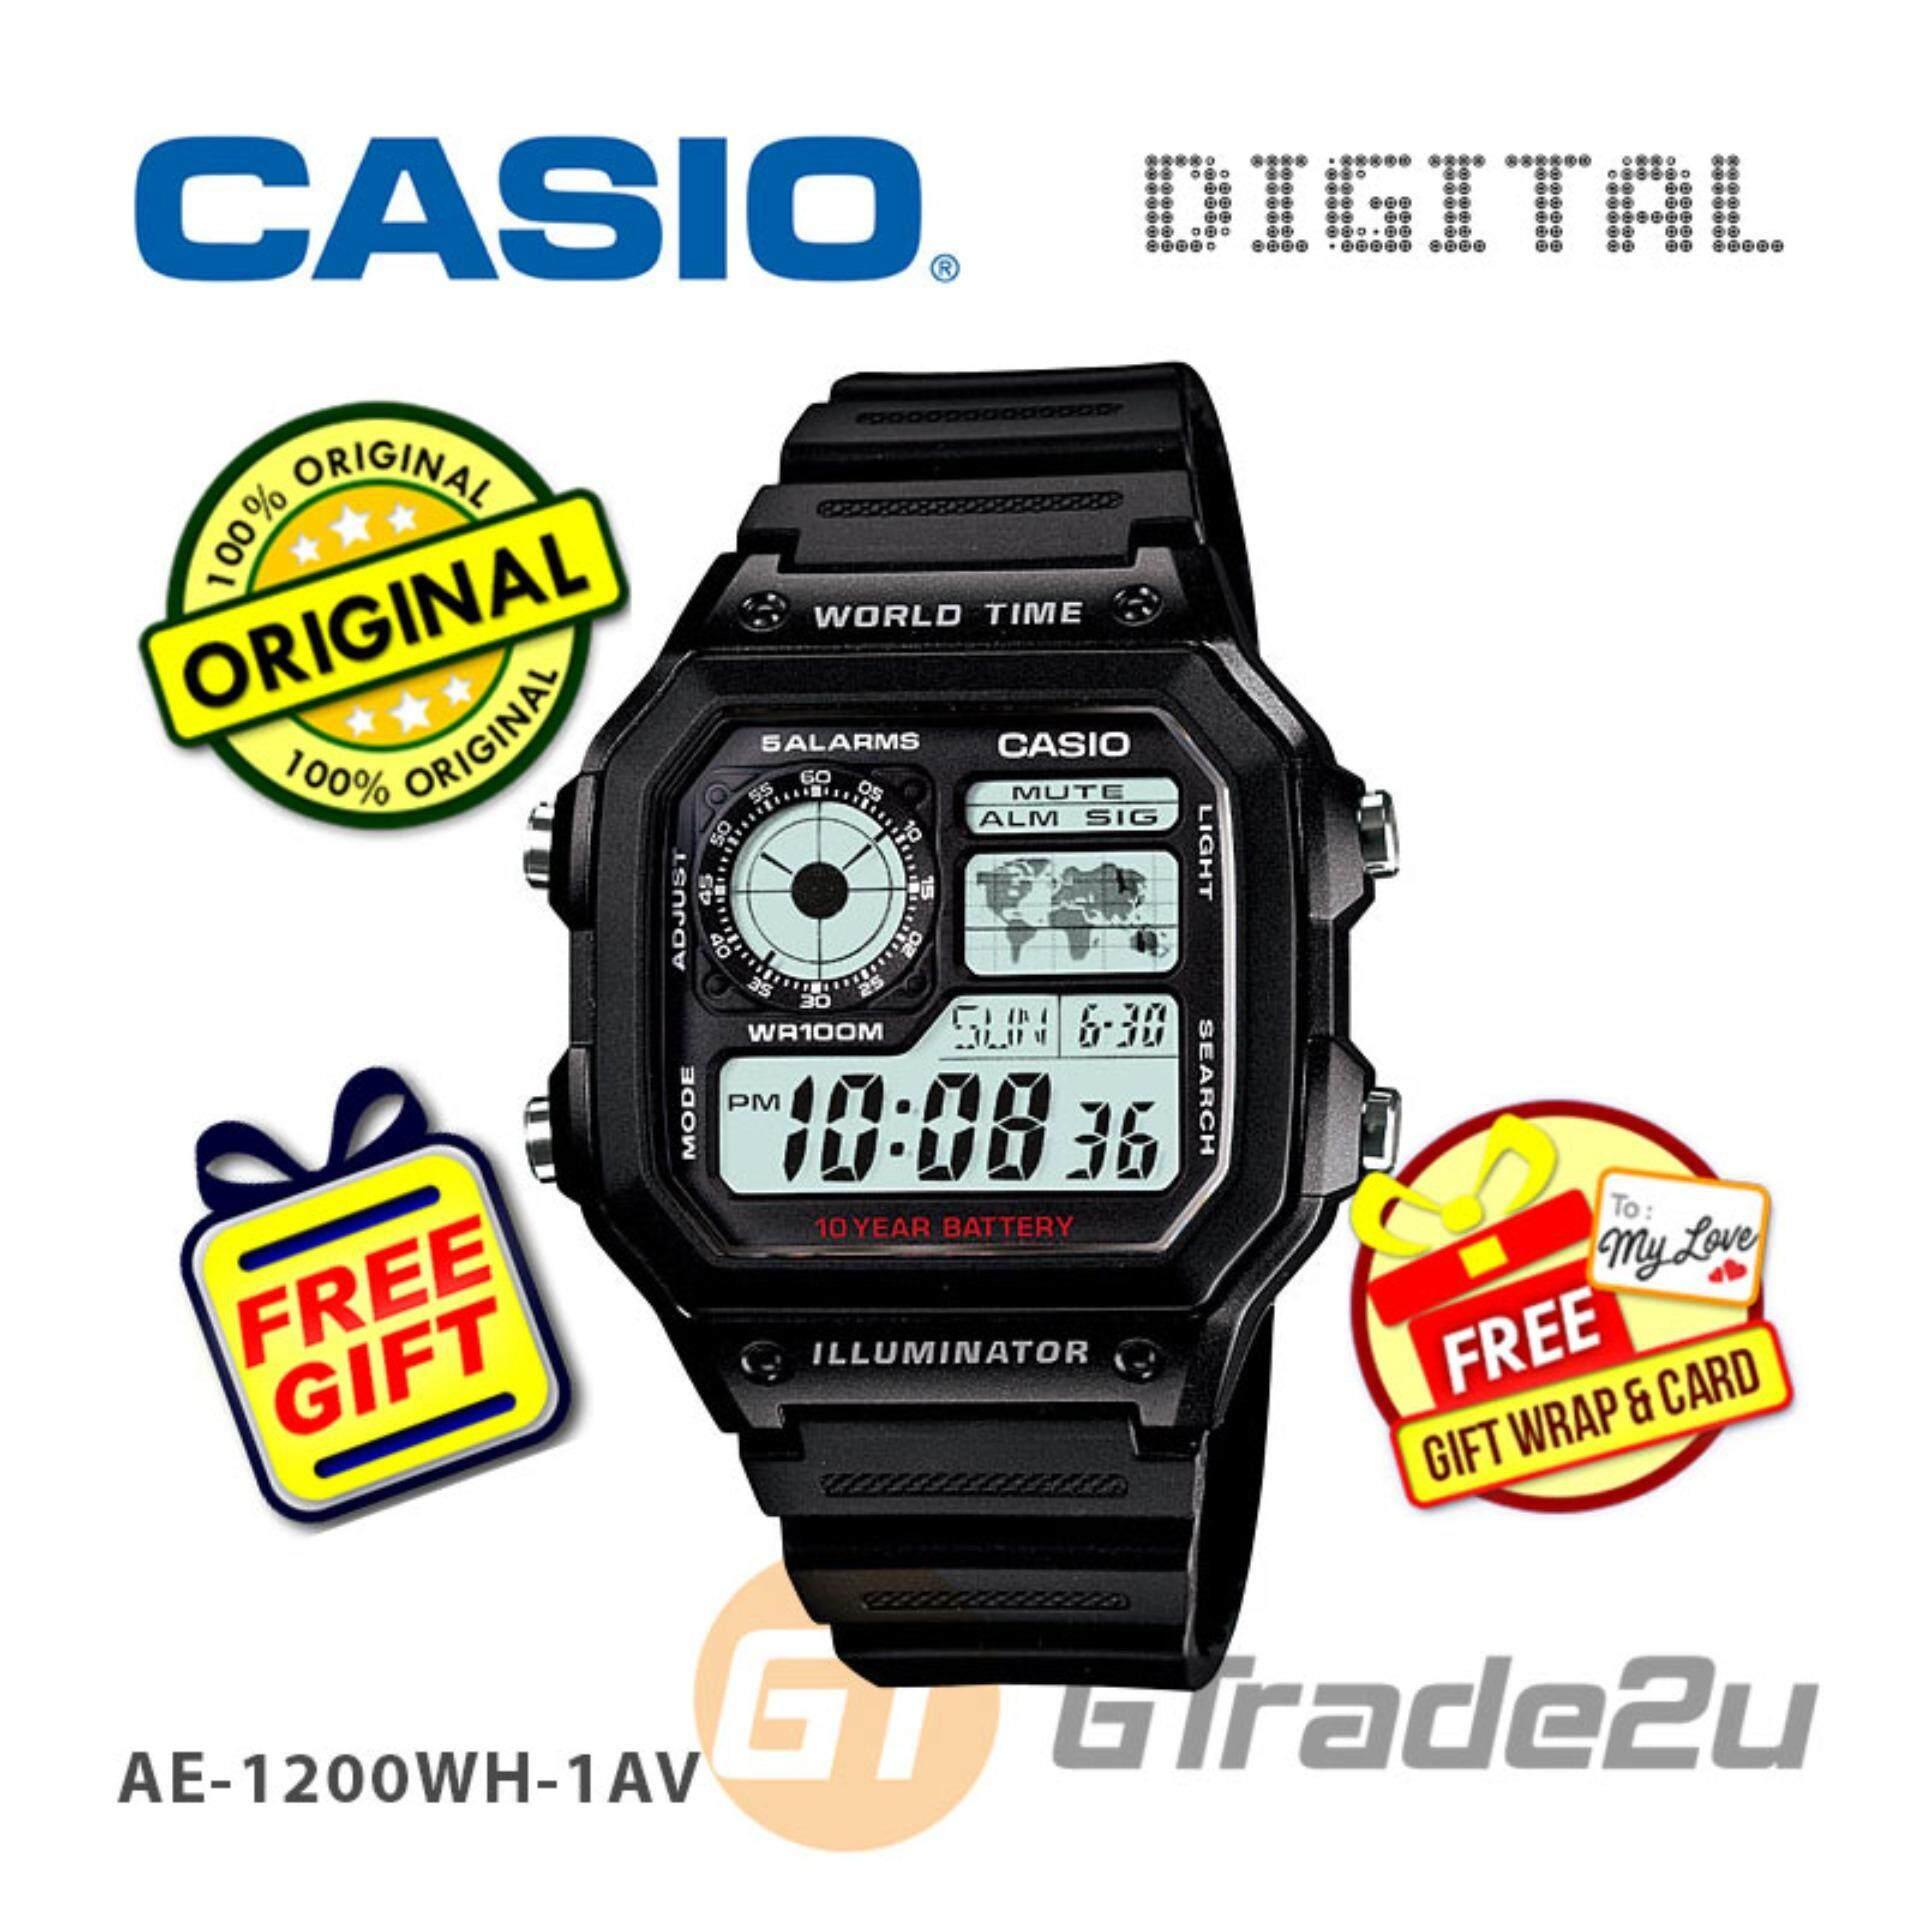 Casio Standard Mens Black Resin Strap Watch AE-1200WH-1AV Jam Tangan Lelaki/Man Malaysia